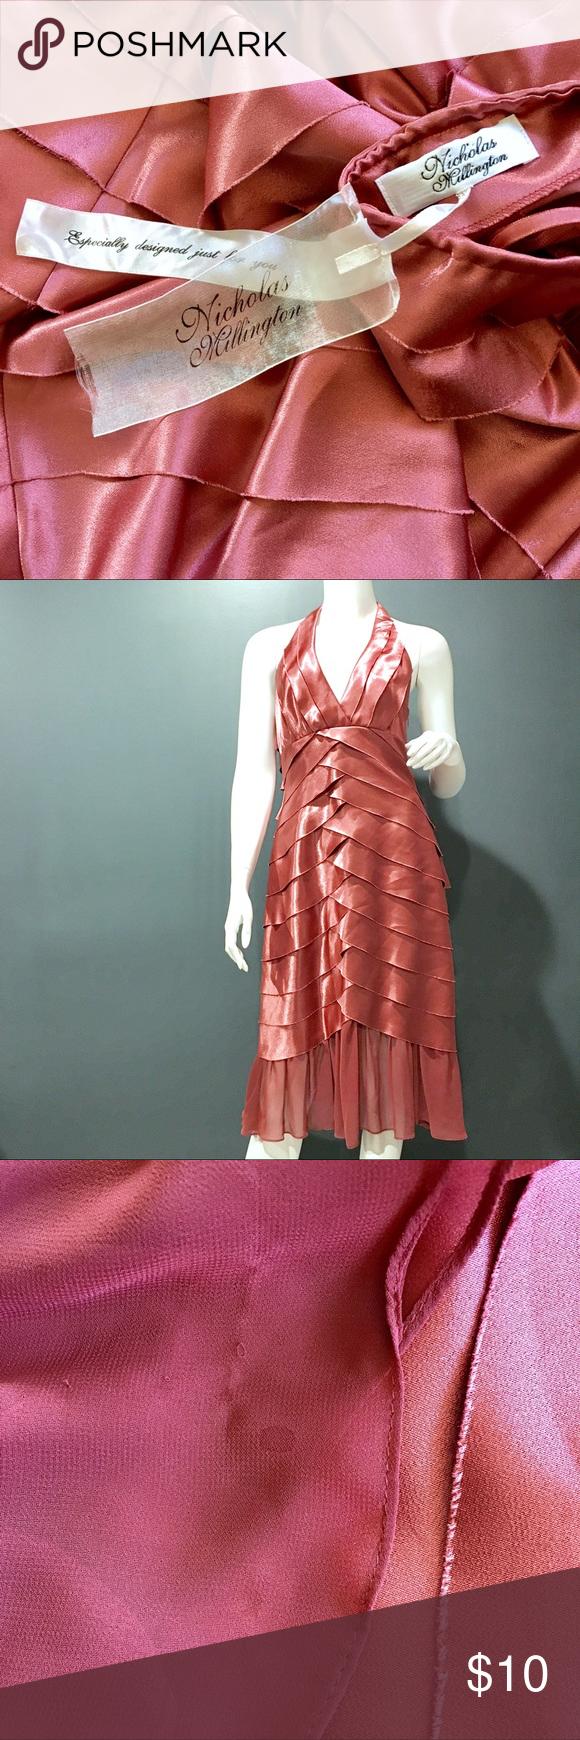 Nicholas willington custom dress